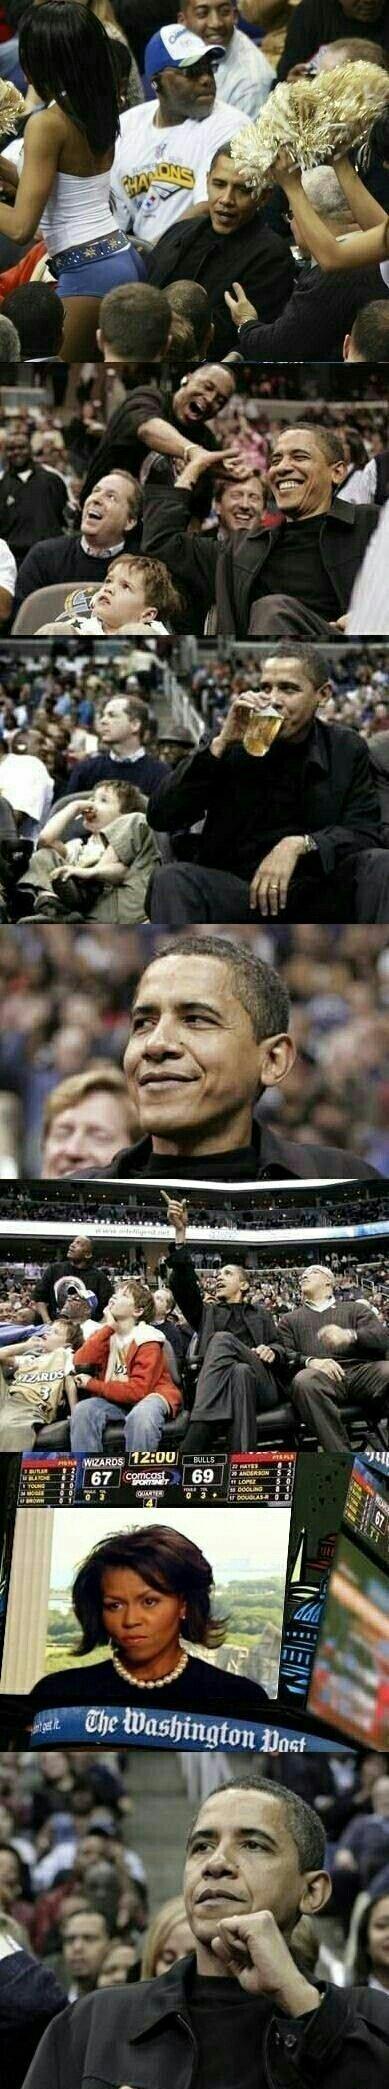 Obama :watchingu: - meme